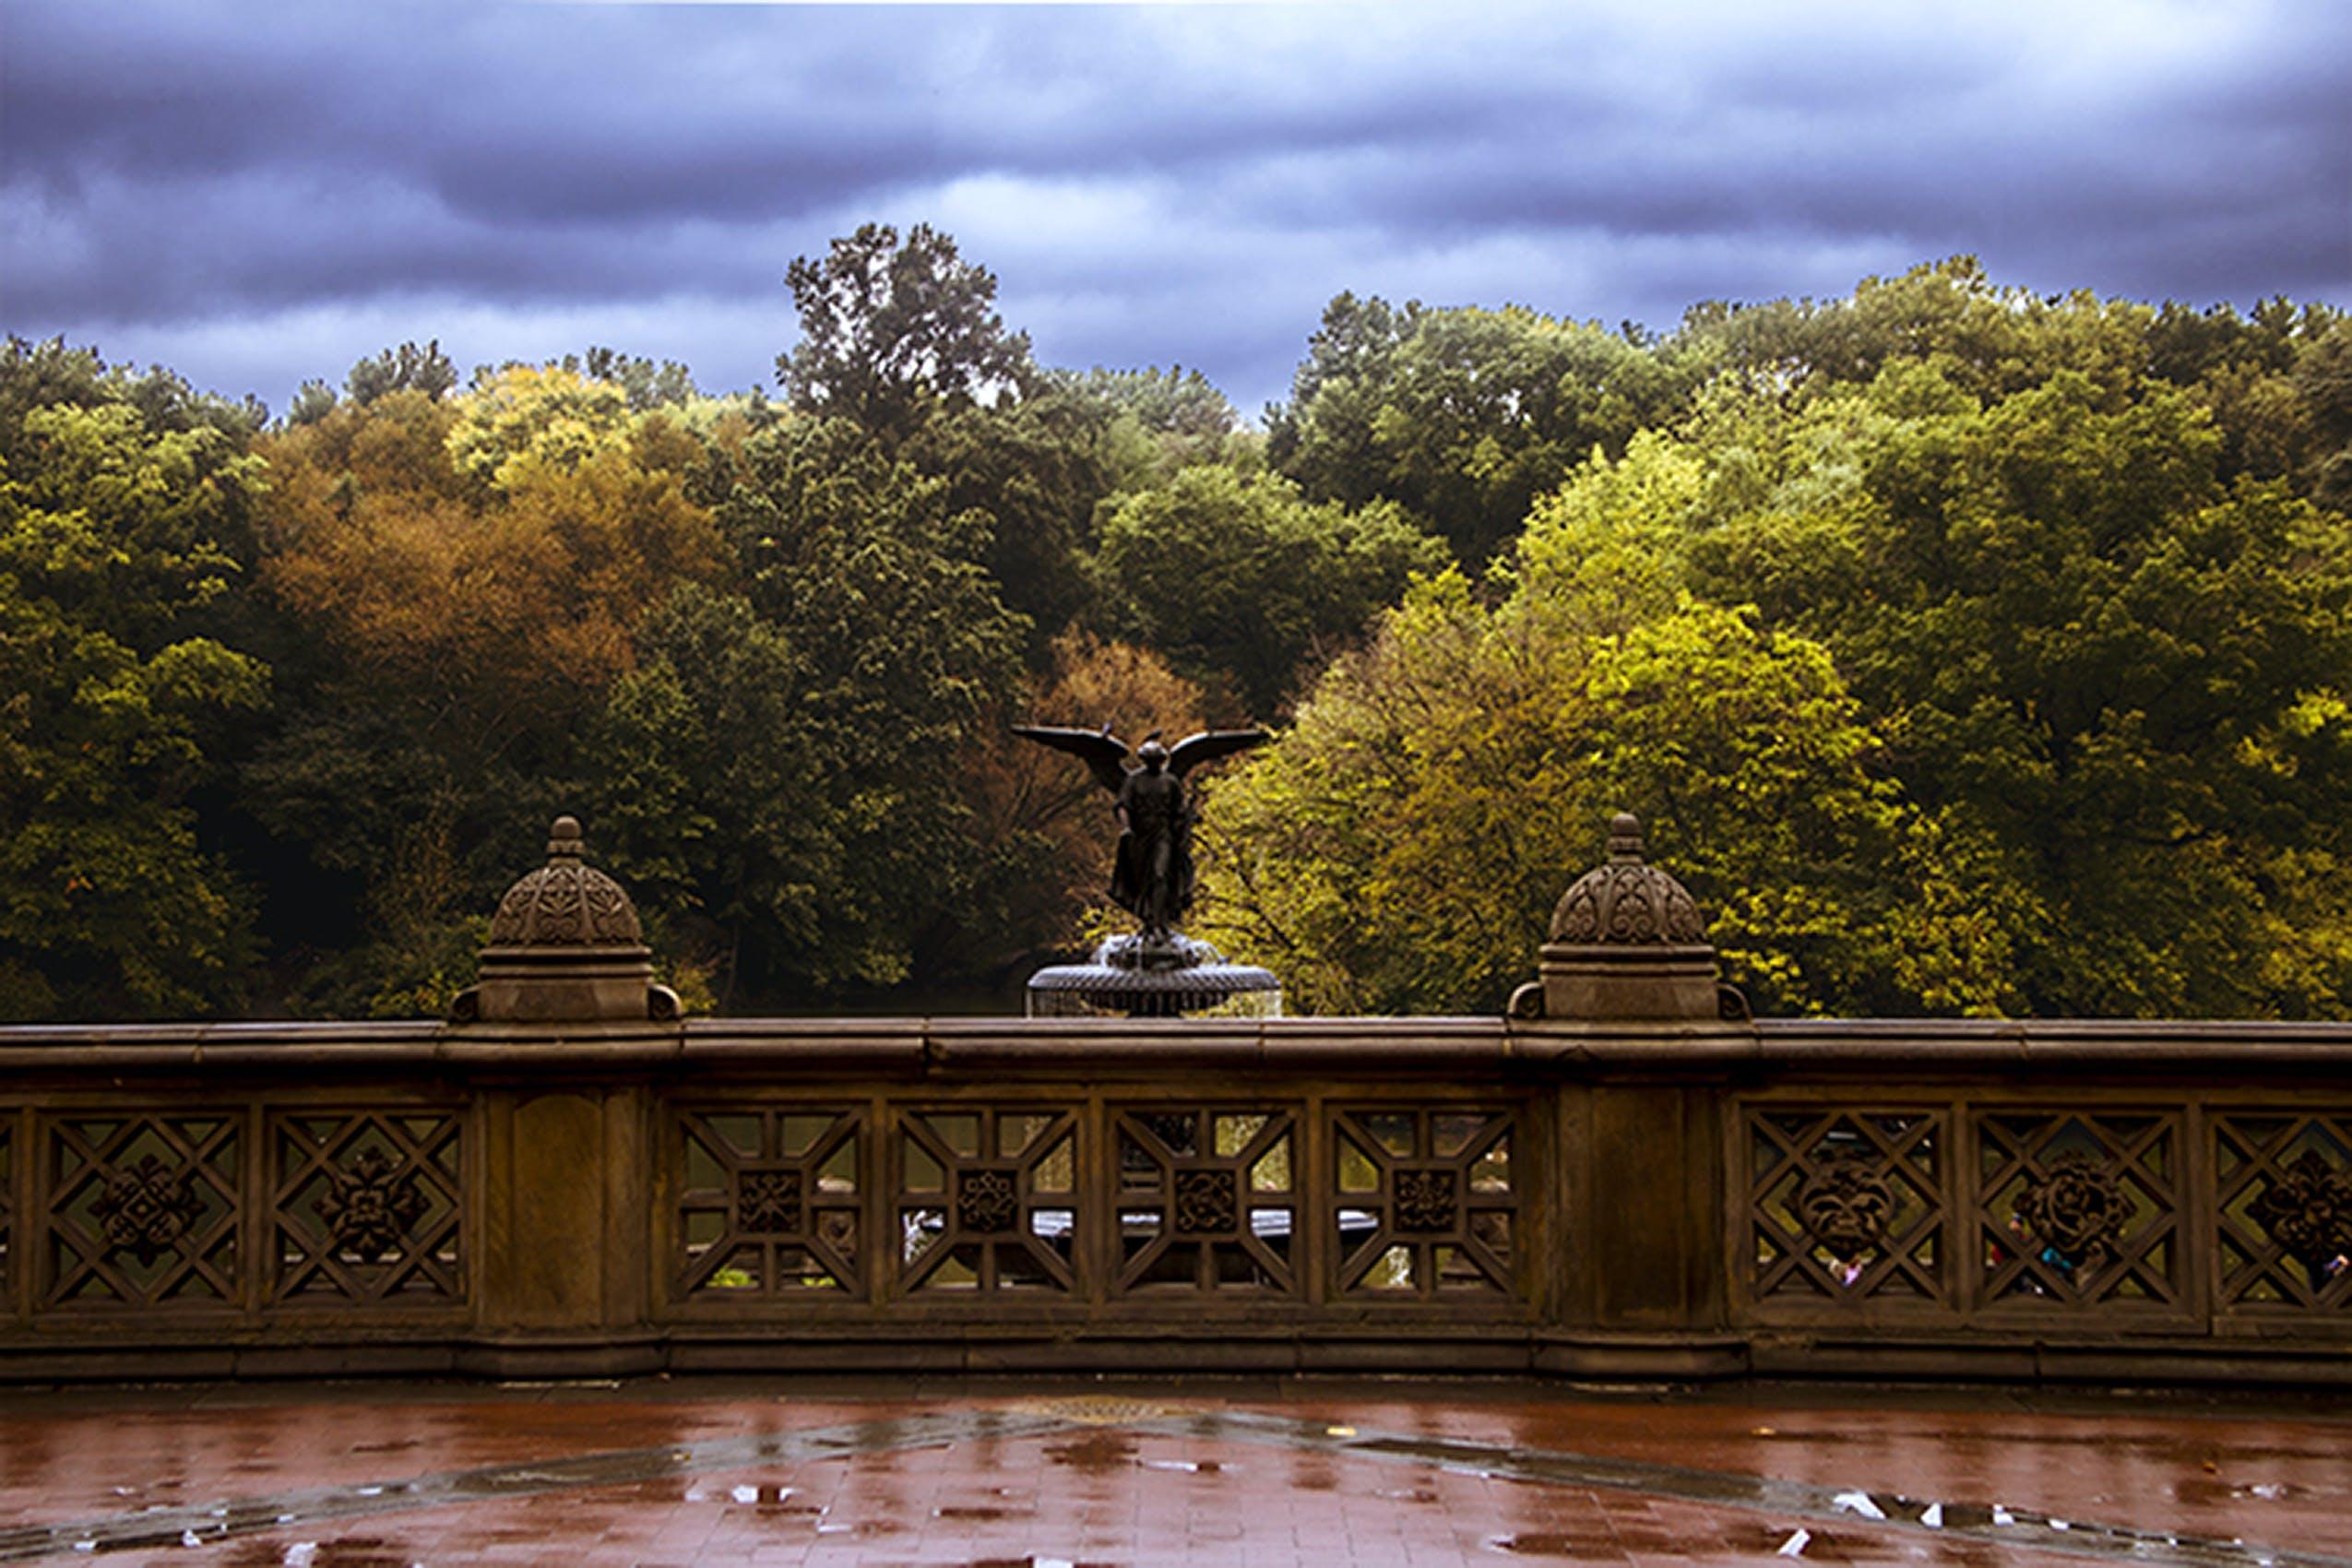 Free stock photo of #architecture, #backdrop, #beauty, #bethesda